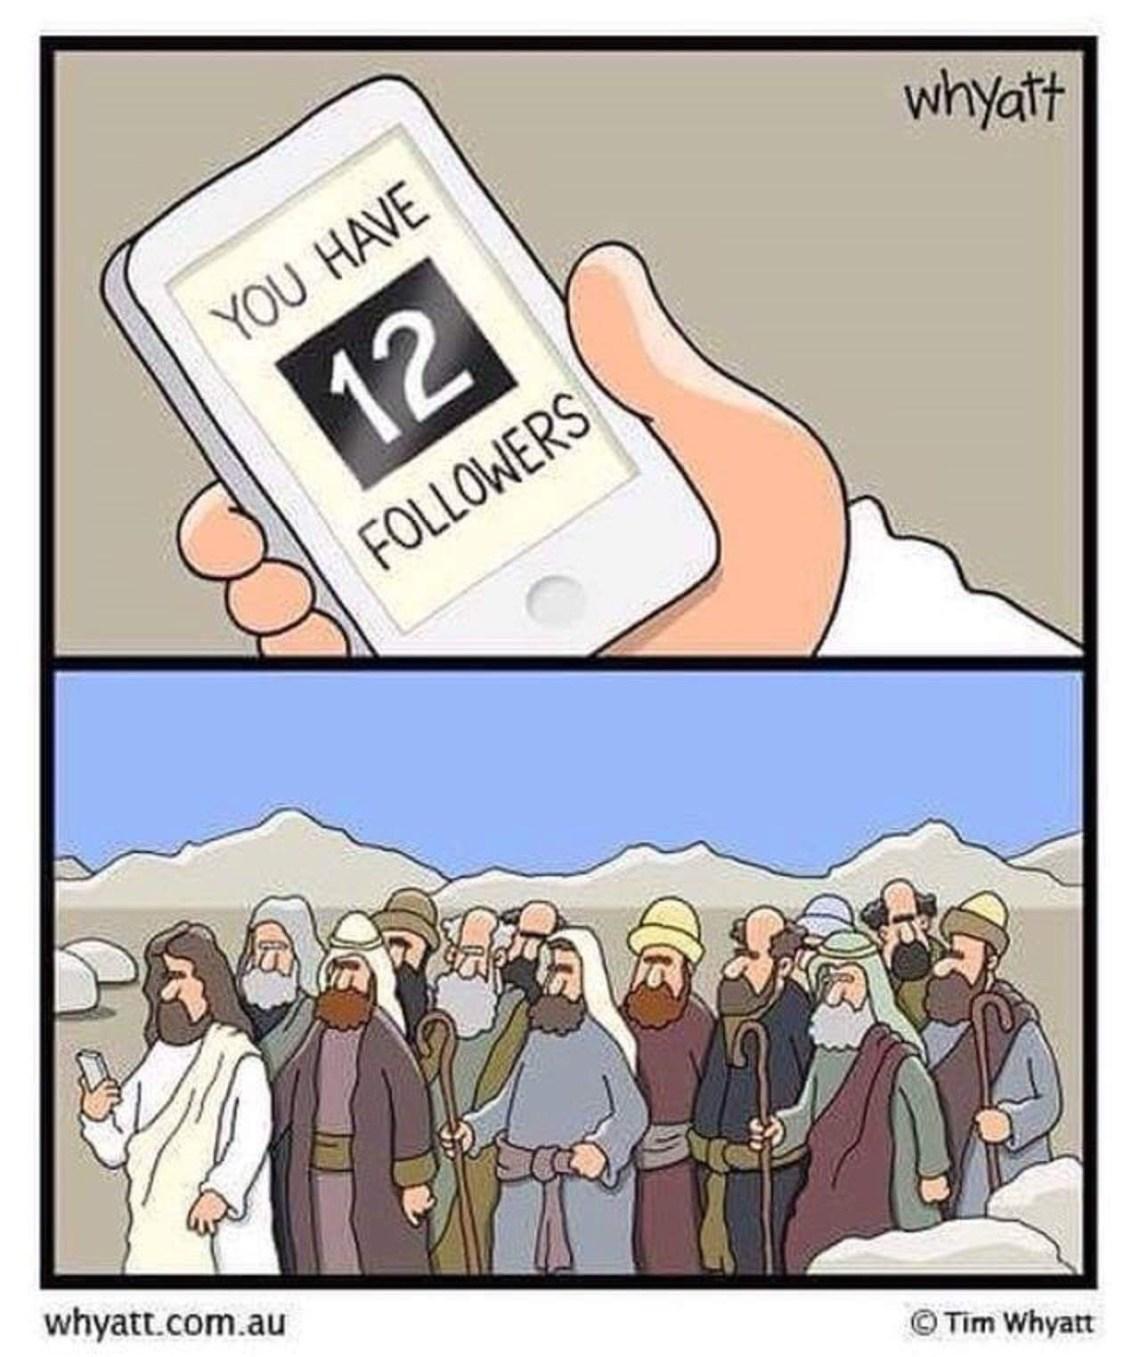 12 followers!  And rising...